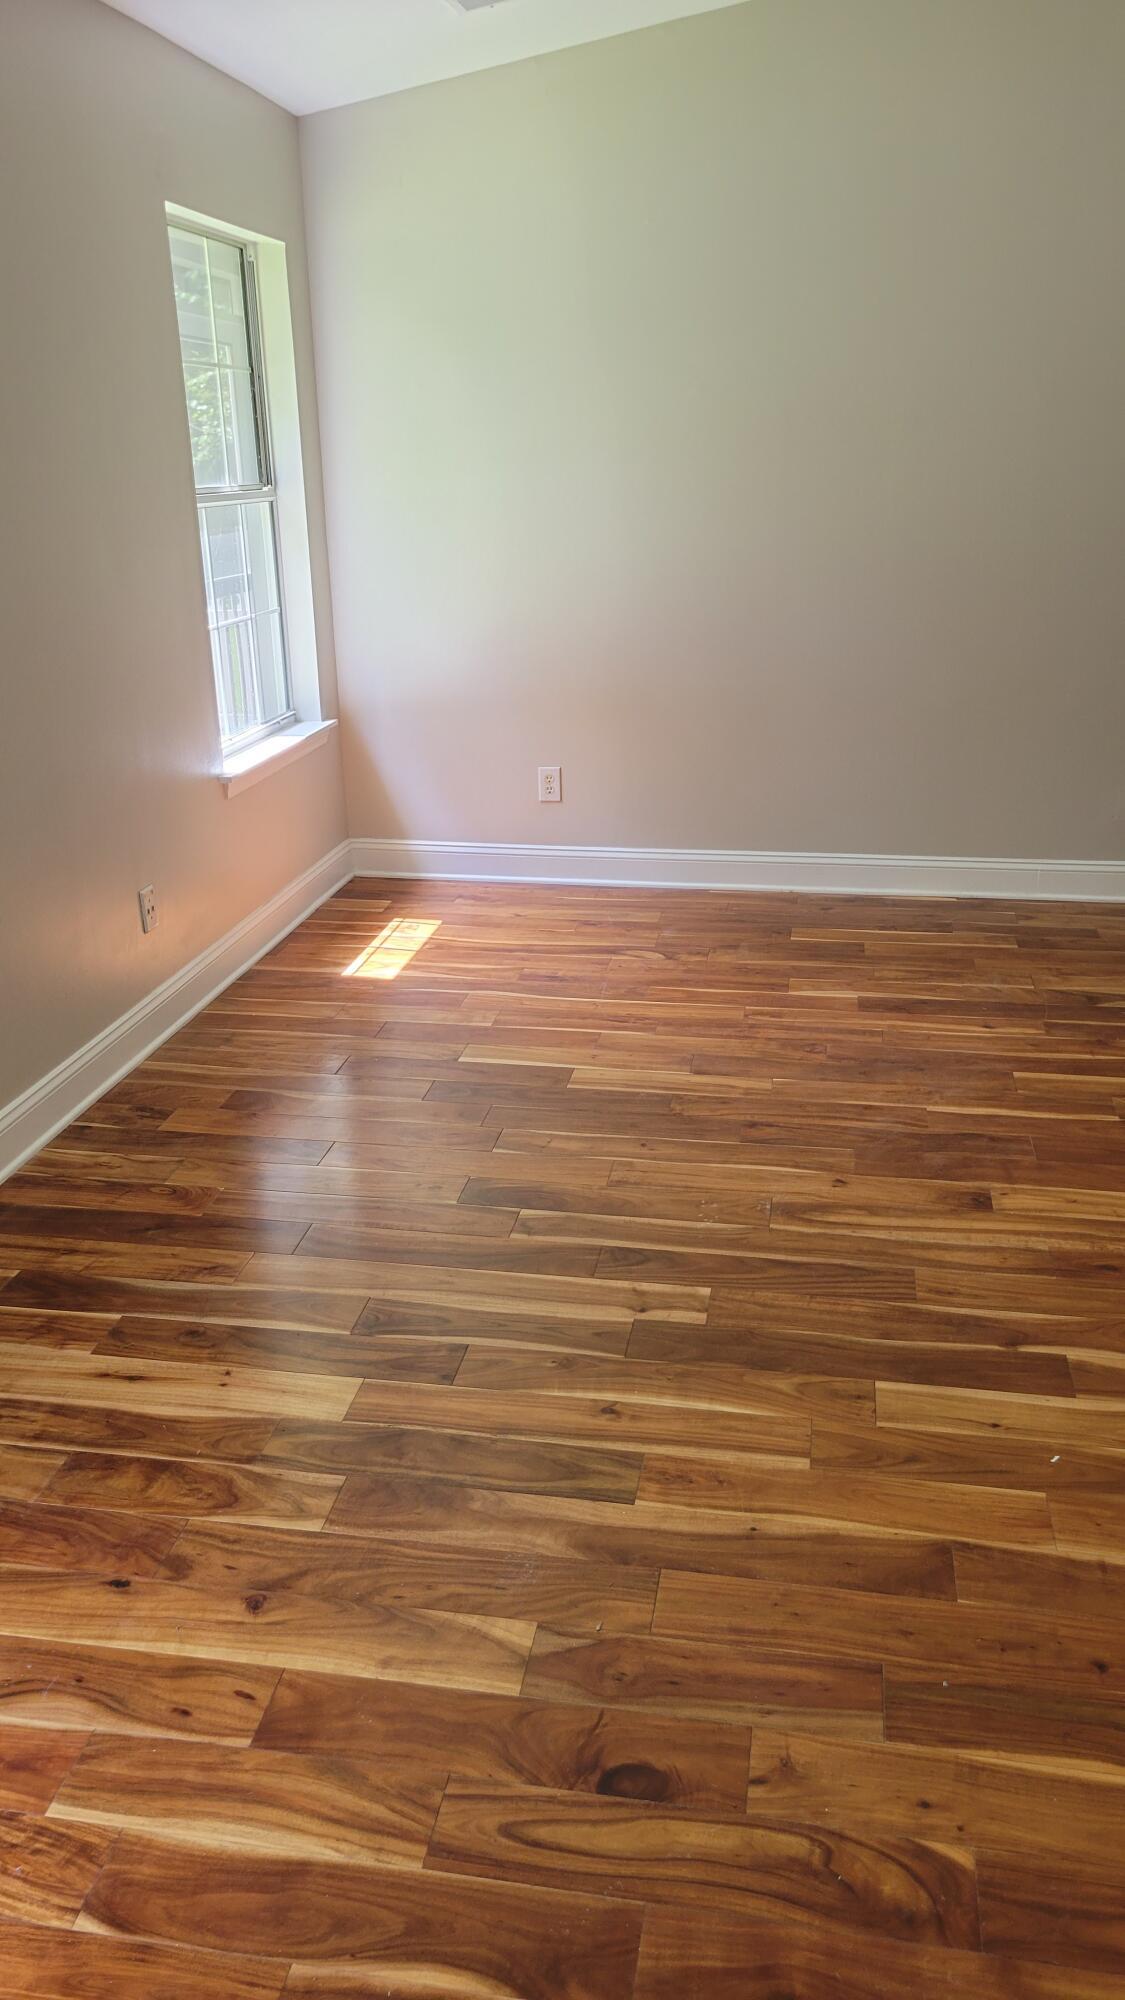 Dunes West Homes For Sale - 2652 Palmetto Hall, Mount Pleasant, SC - 17